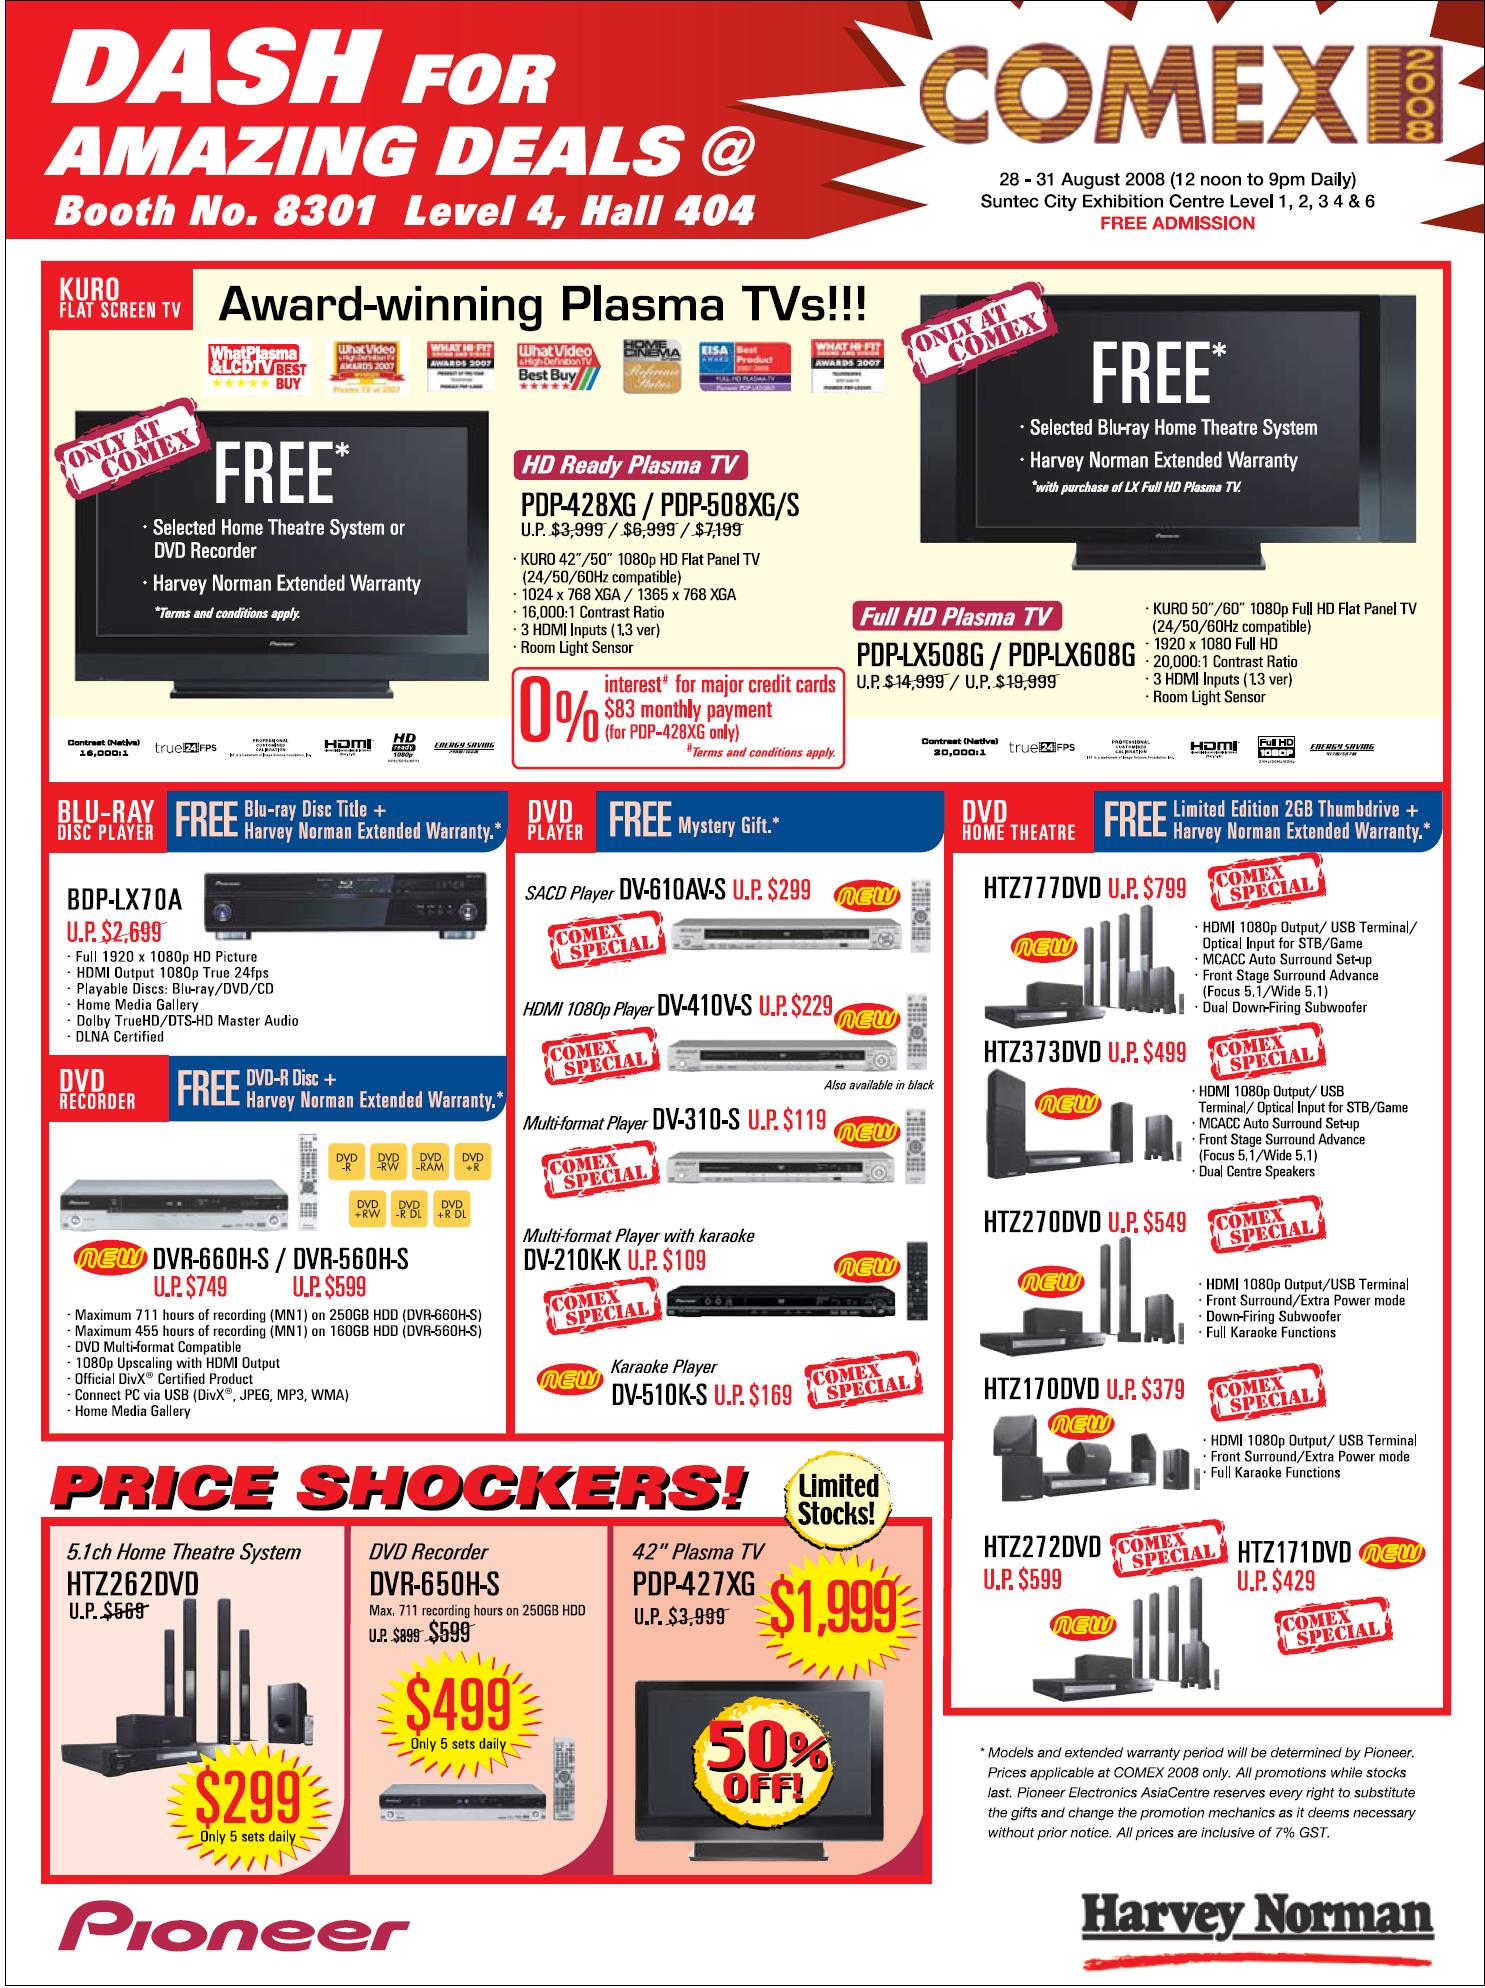 Comex 2008 price list image brochure of Pioneer